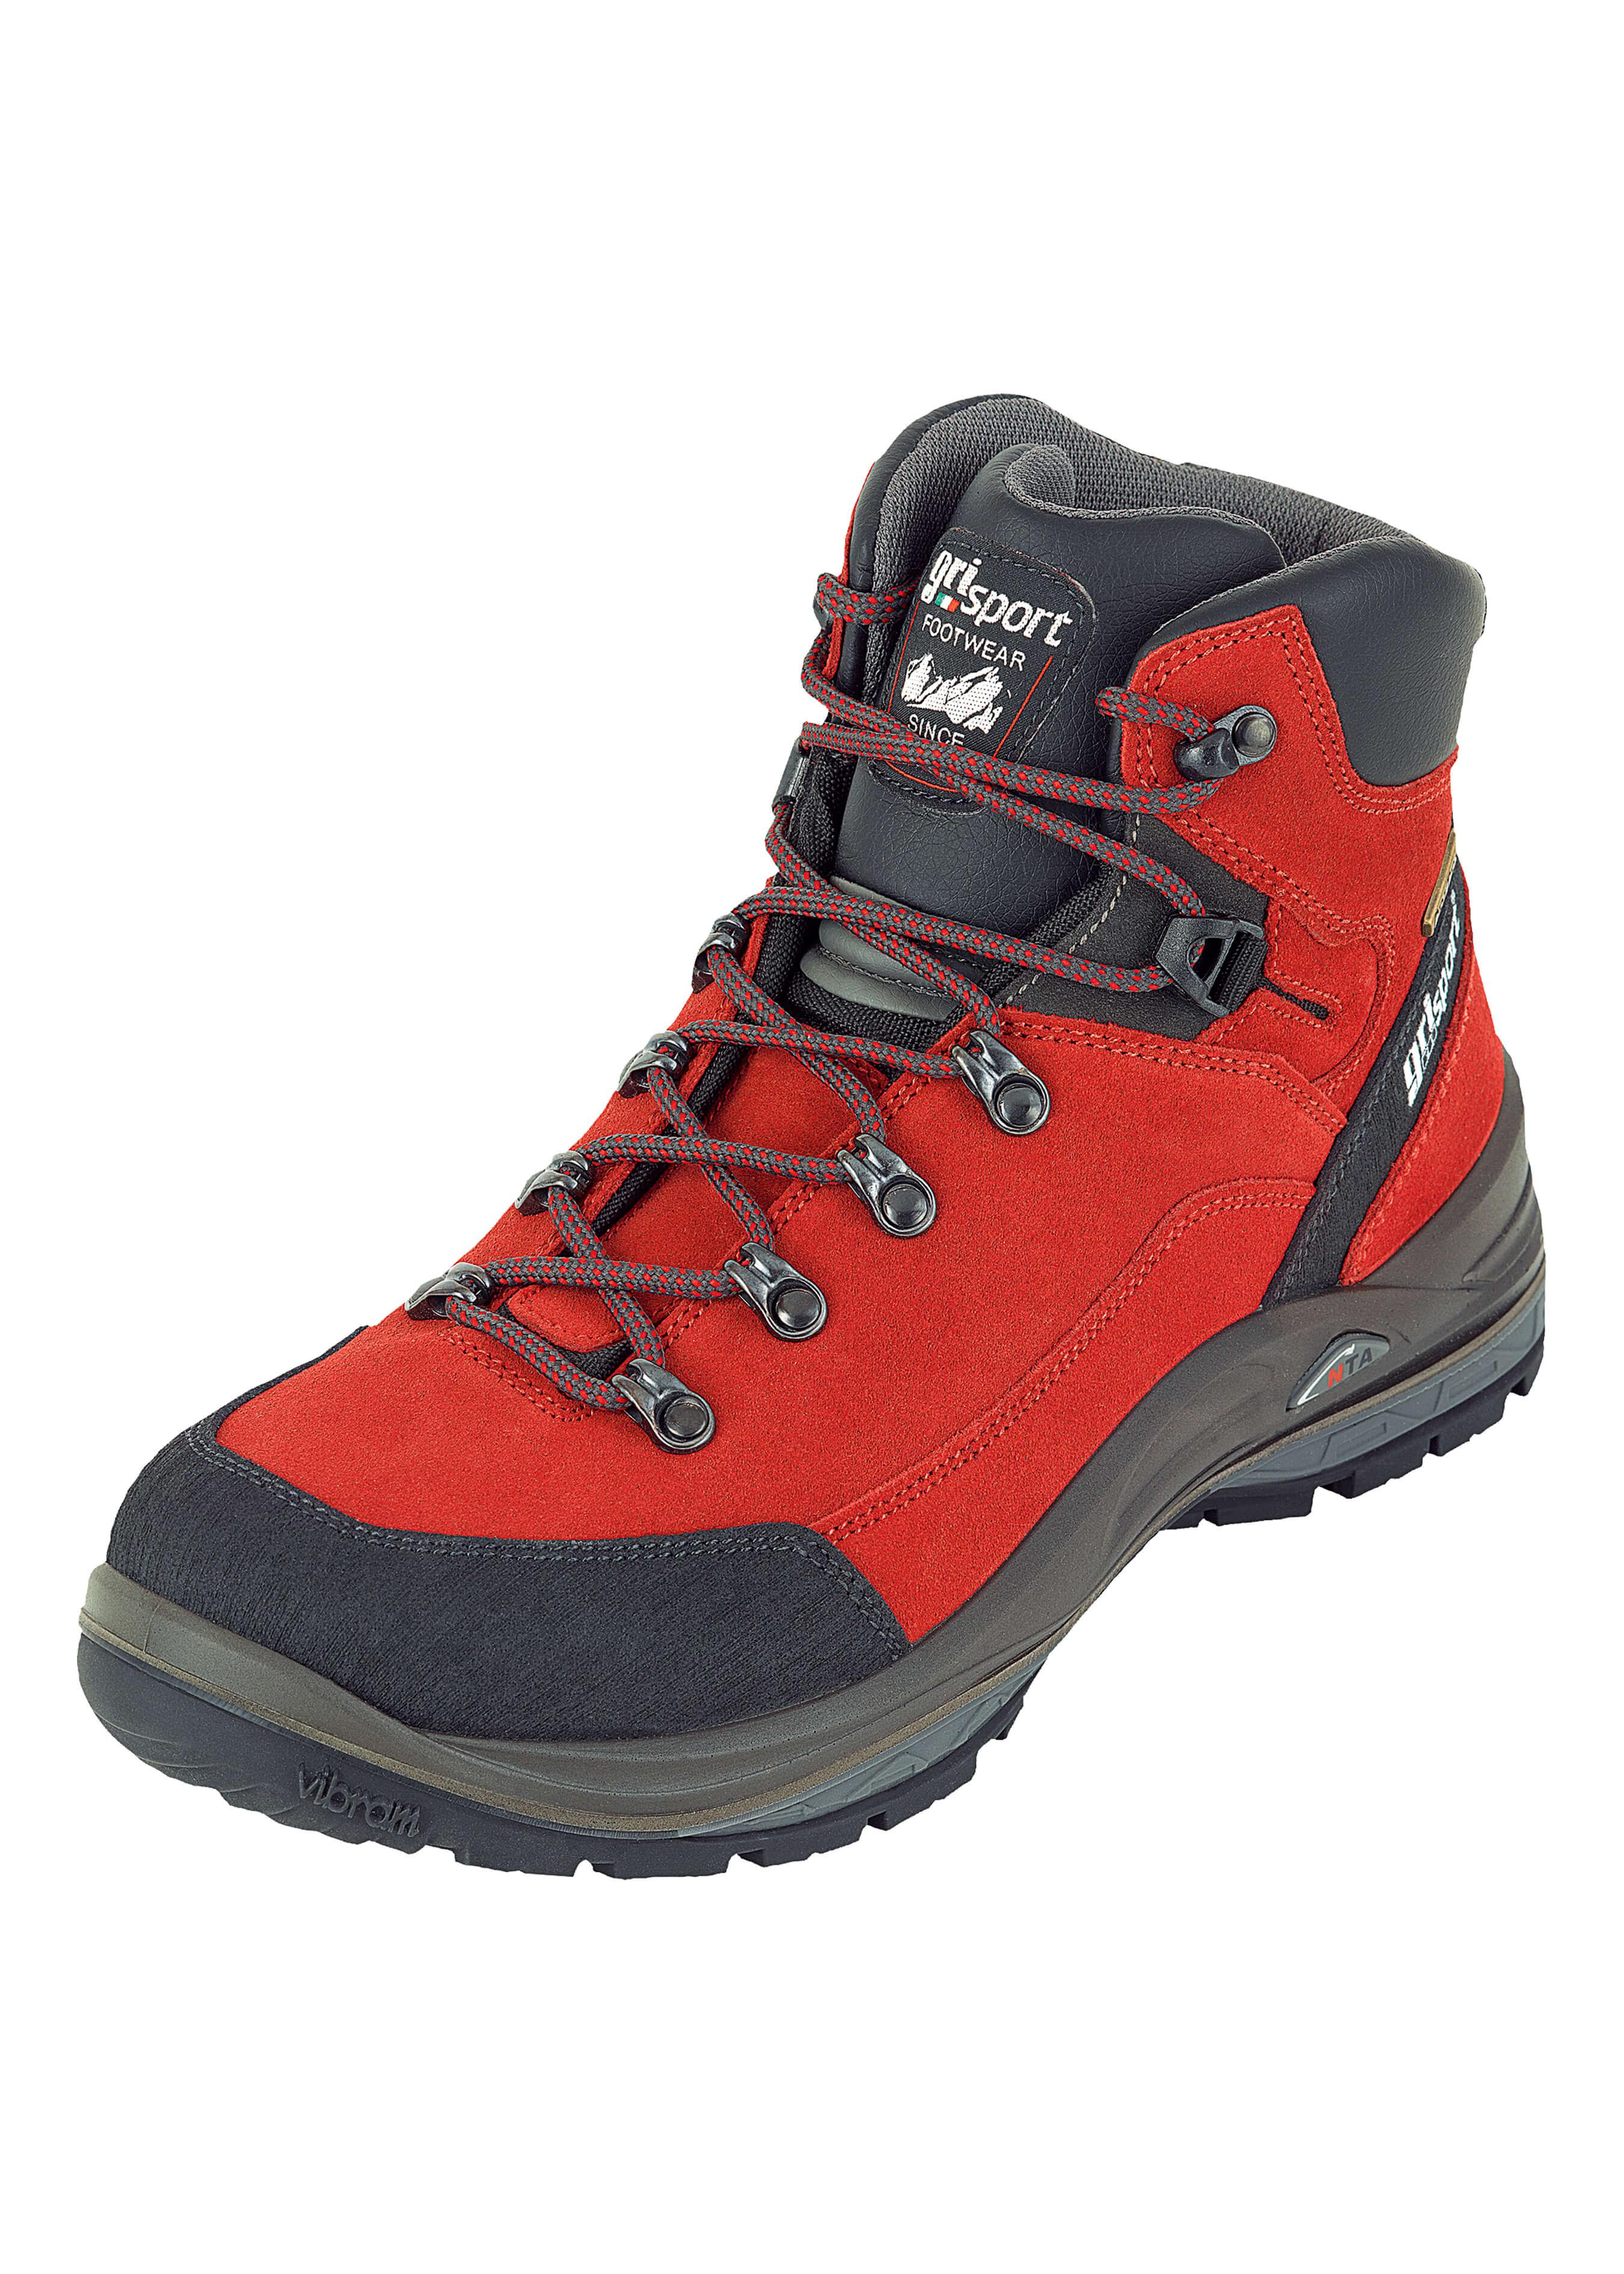 Chaussure de trekking en cuir nubuck 40194336 1